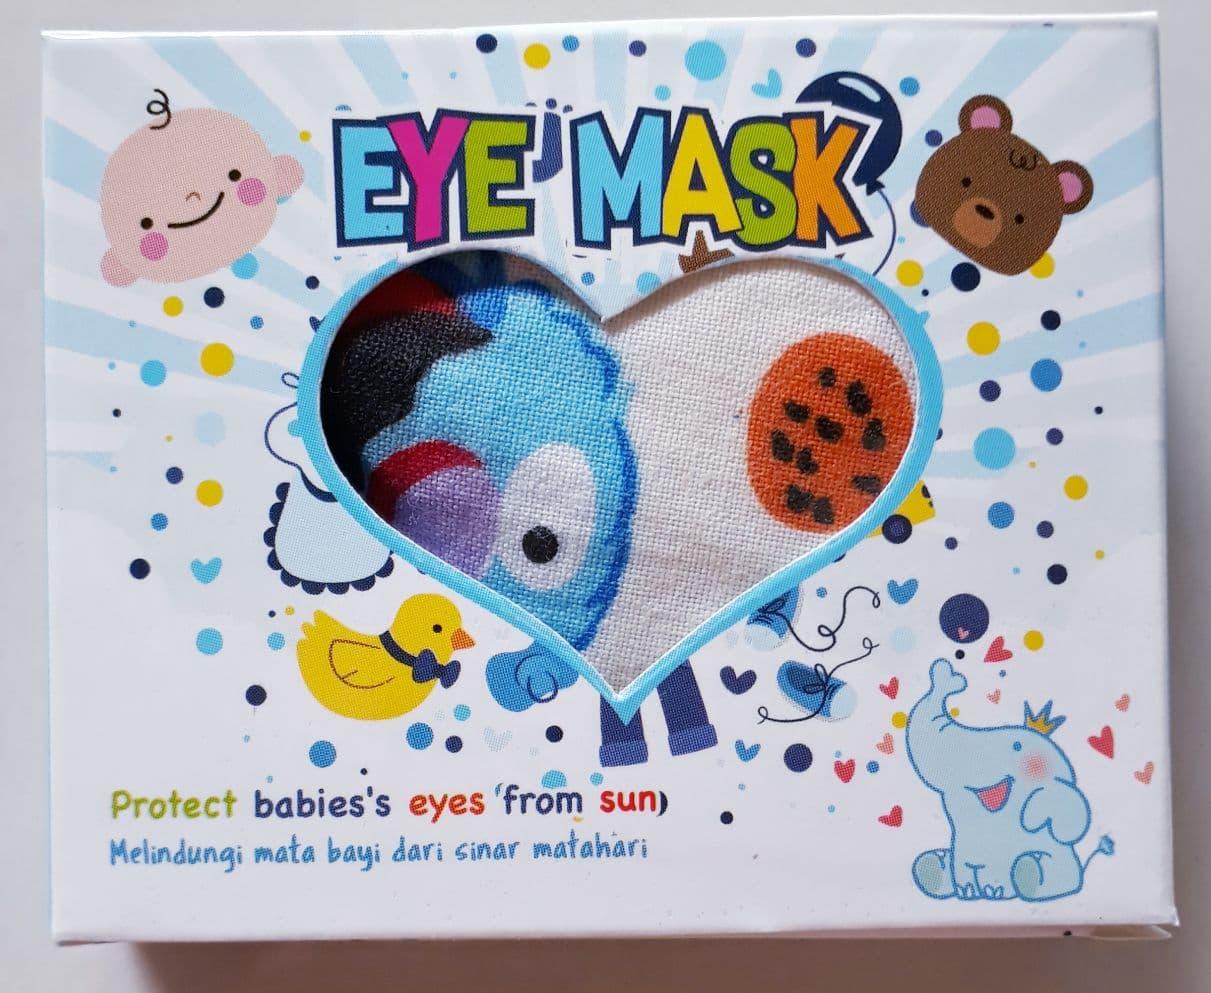 Tempat Jual Sunny Baby Eye Mask Kacamata Jemur Bayi Termurah 2018 Raket Anak Morris Yonex Atau Yonez Alvaro Eyesmask Penutup Mata